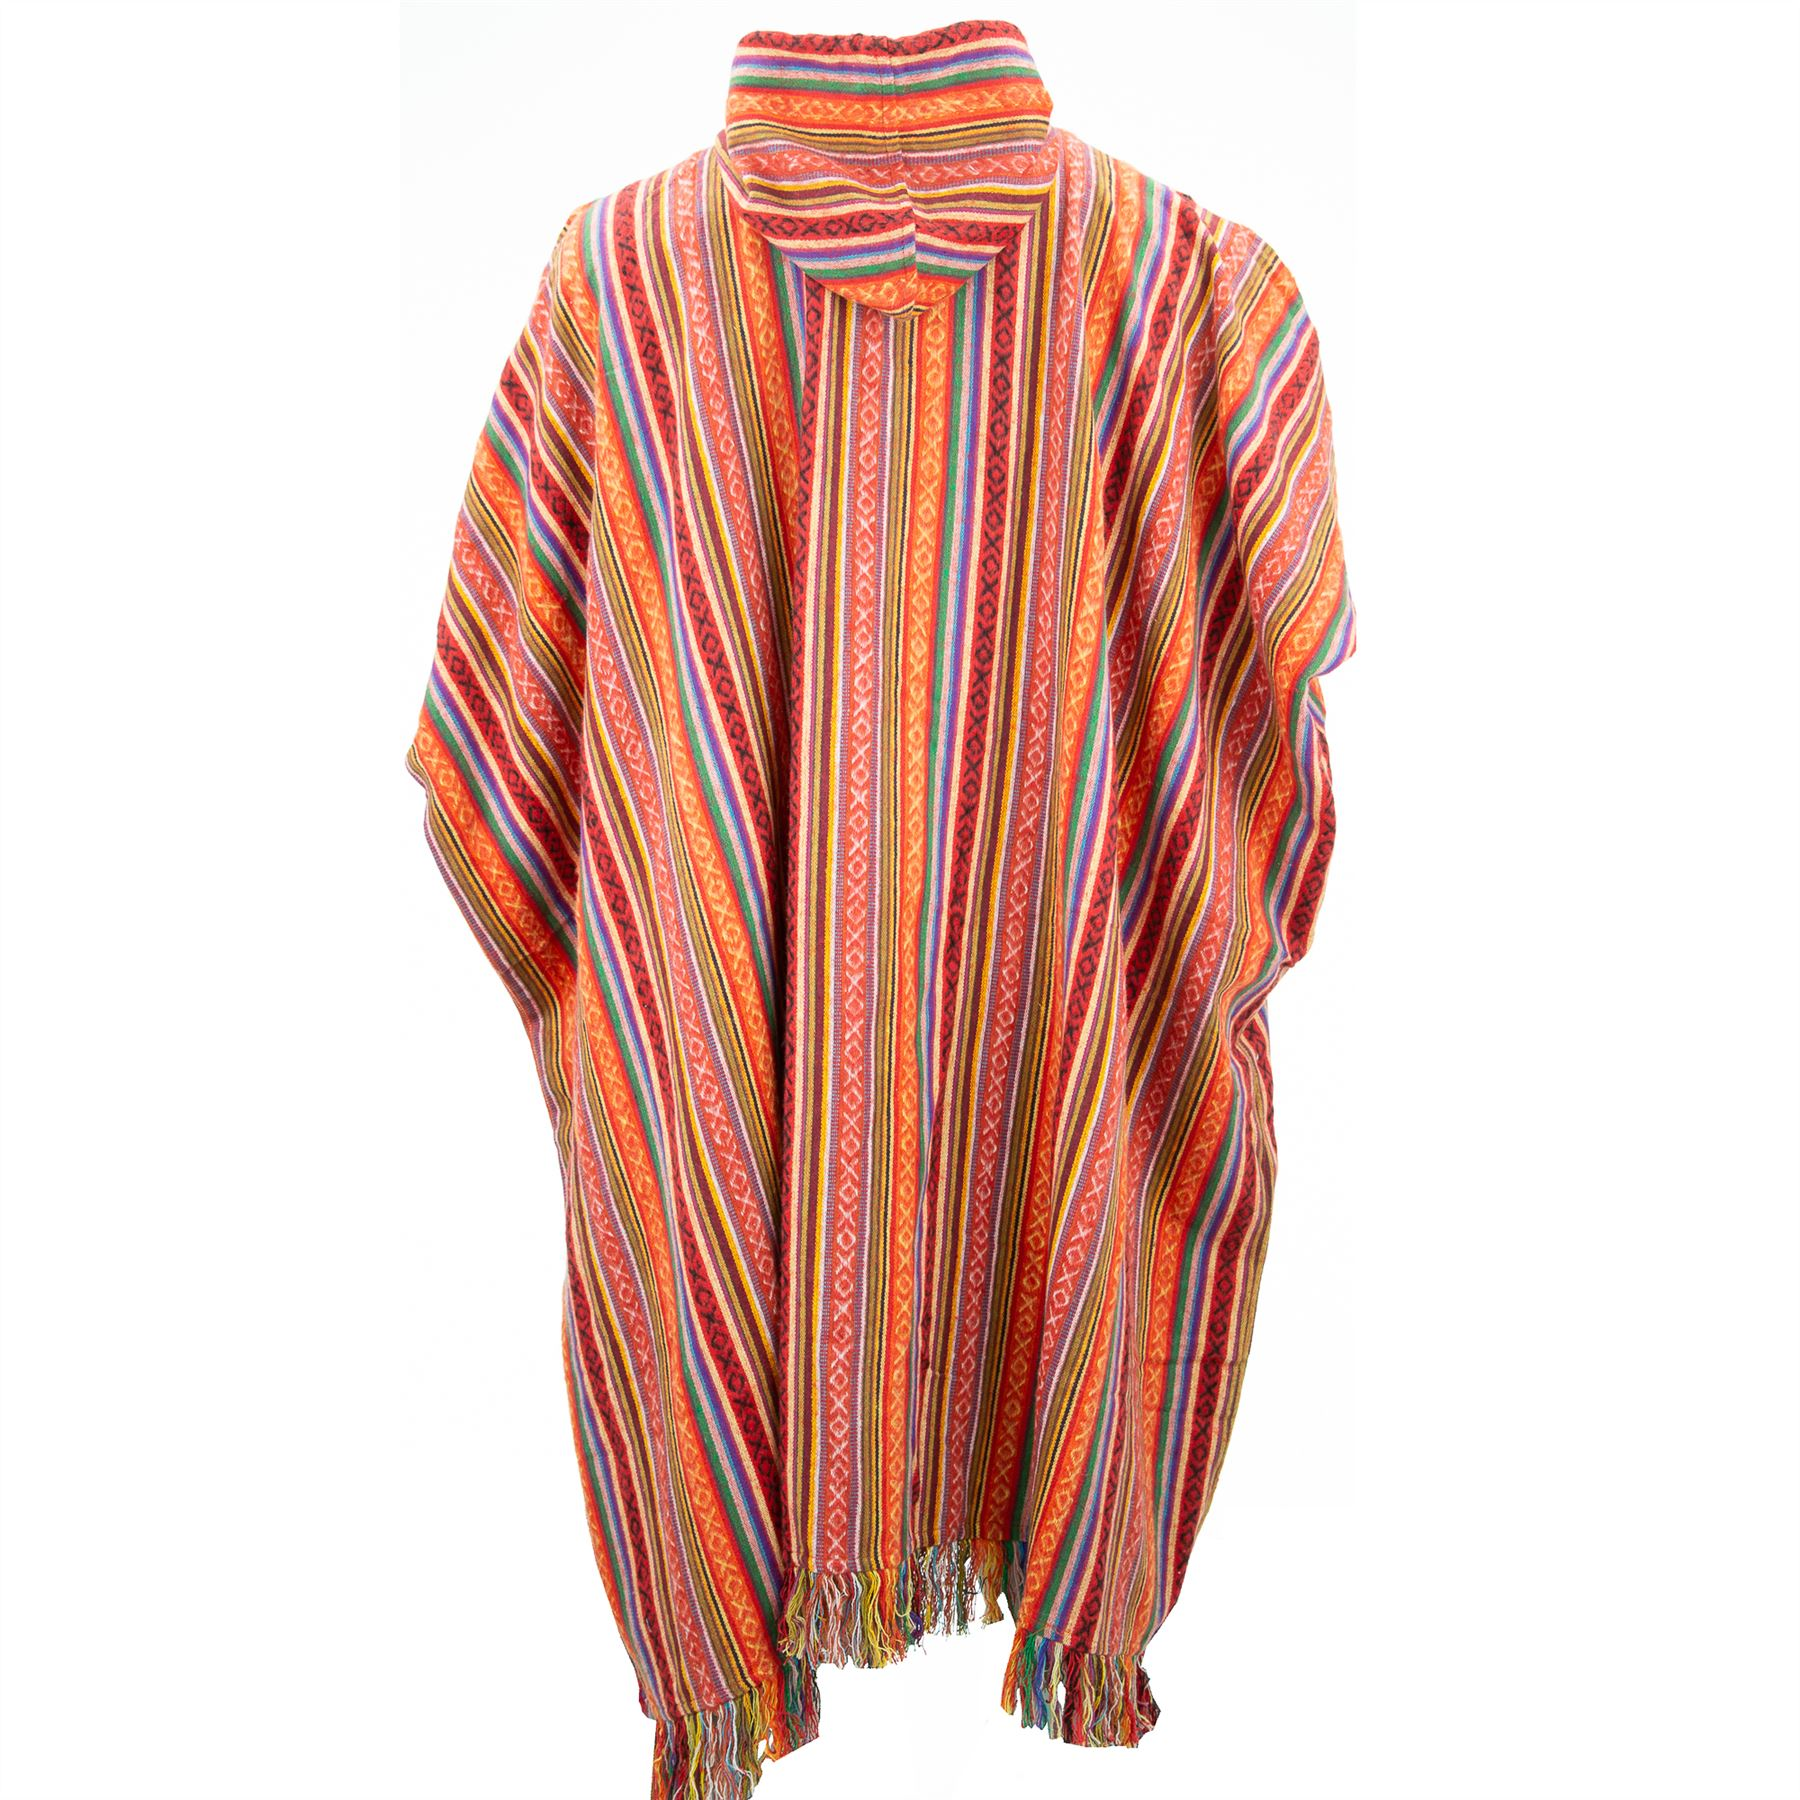 Poncho-Hooded-Cape-Cotton-Warm-Festival-Long-Woven-Rainbow-Men-Women thumbnail 3